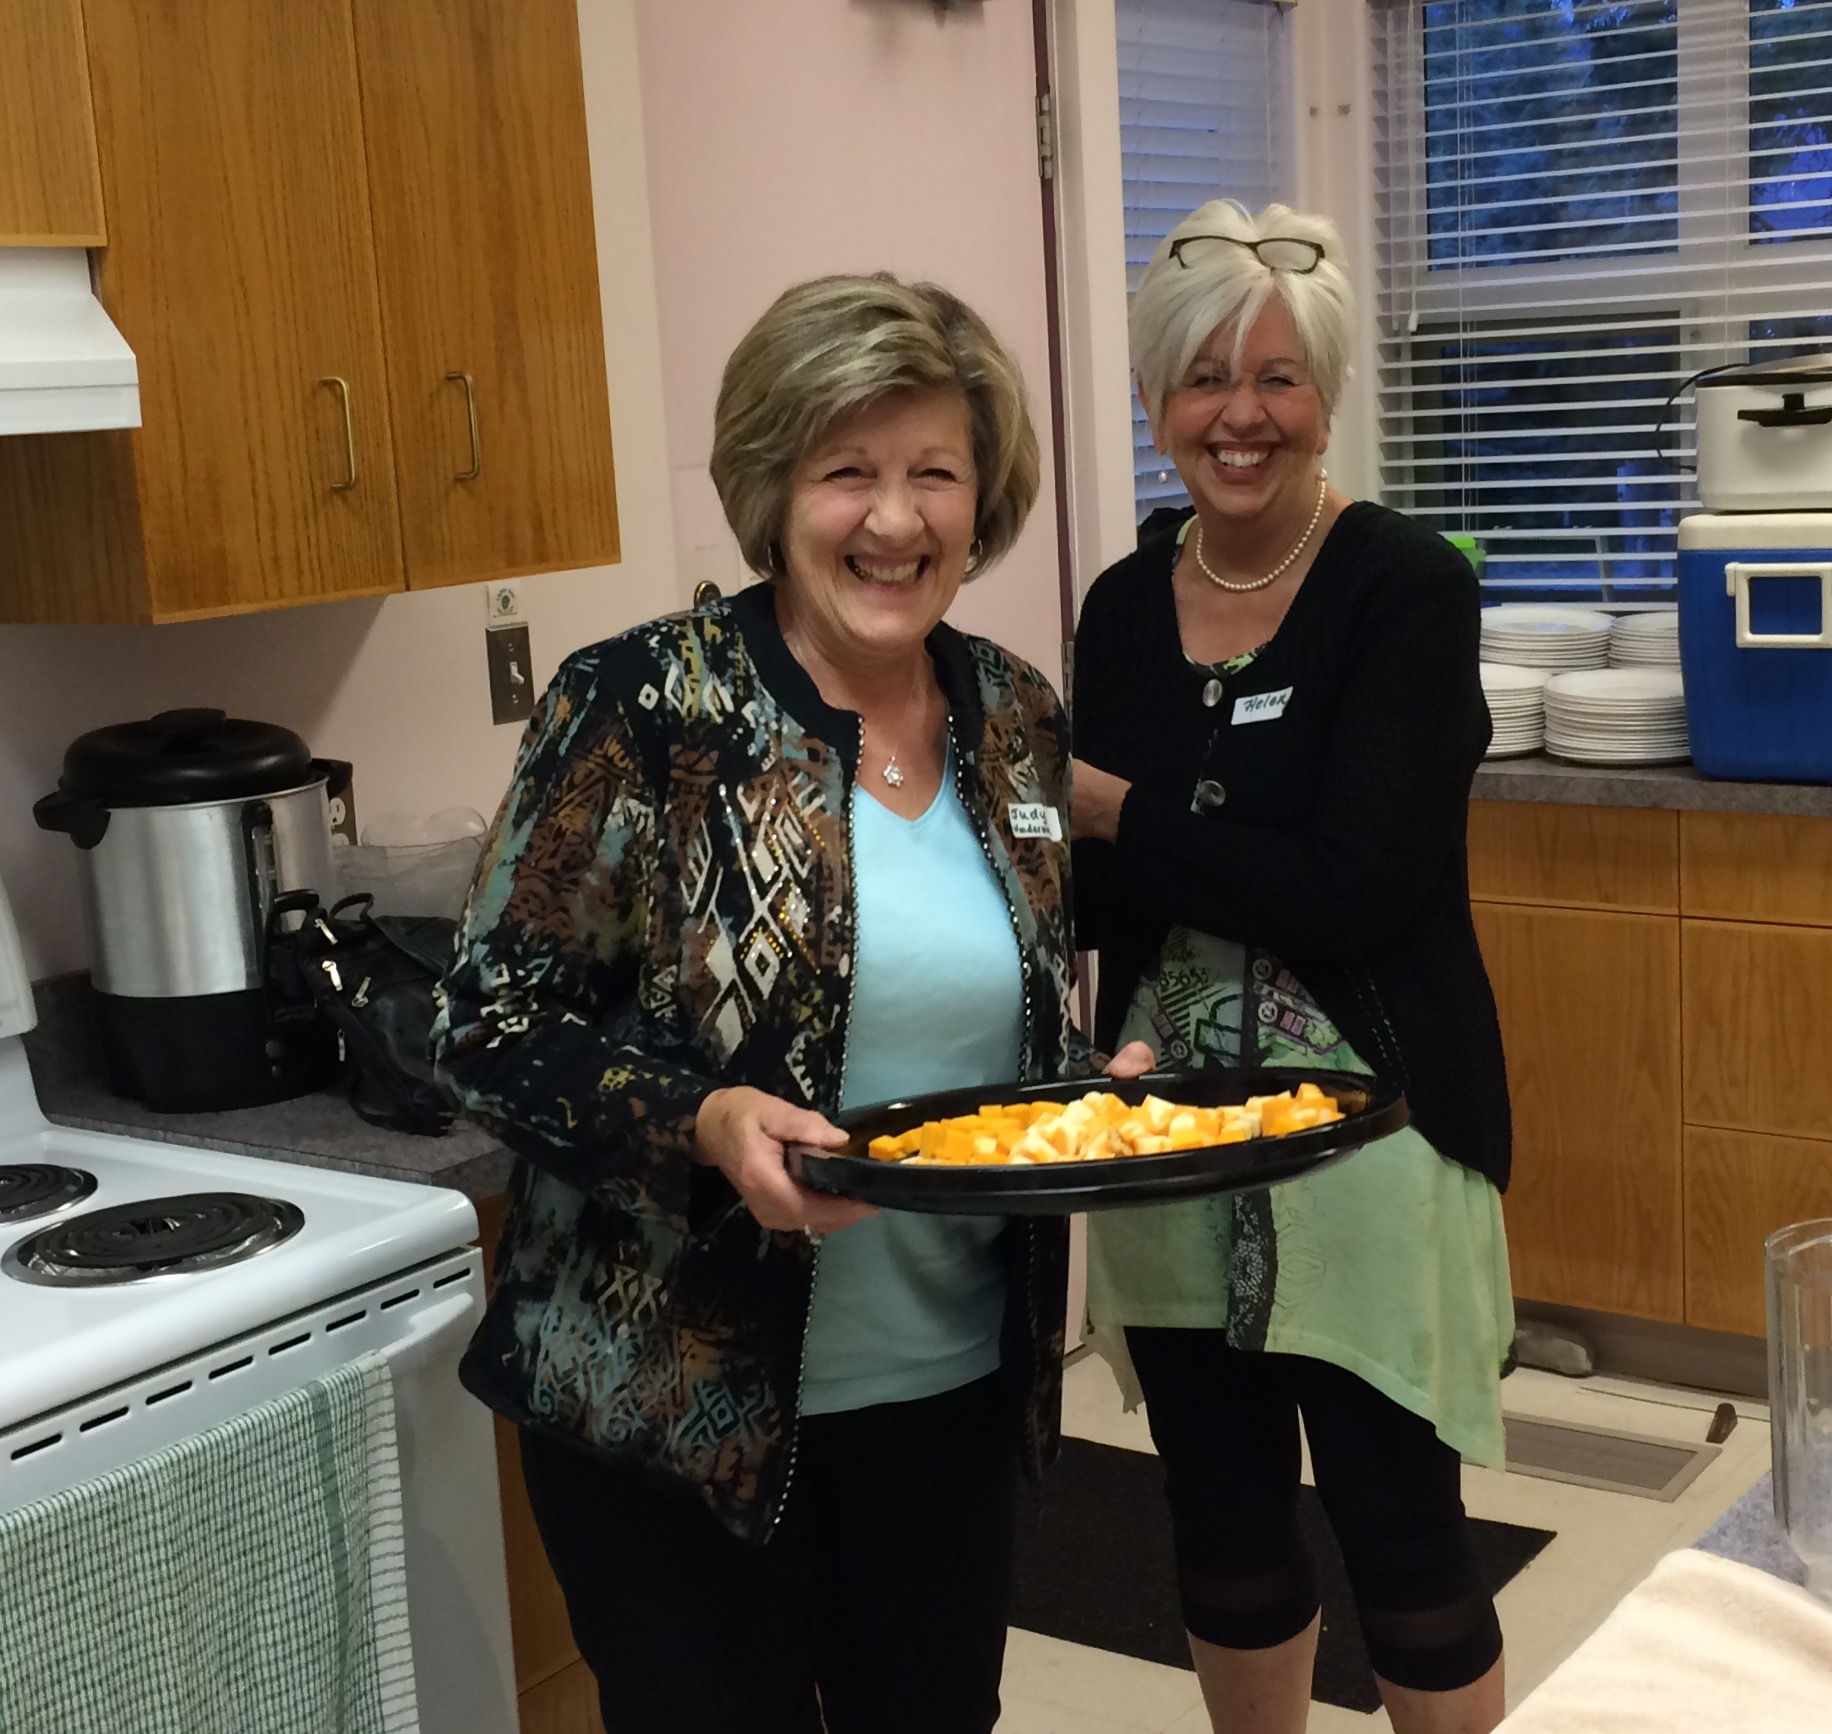 Judy Frain & Helen Franken prepare the feast